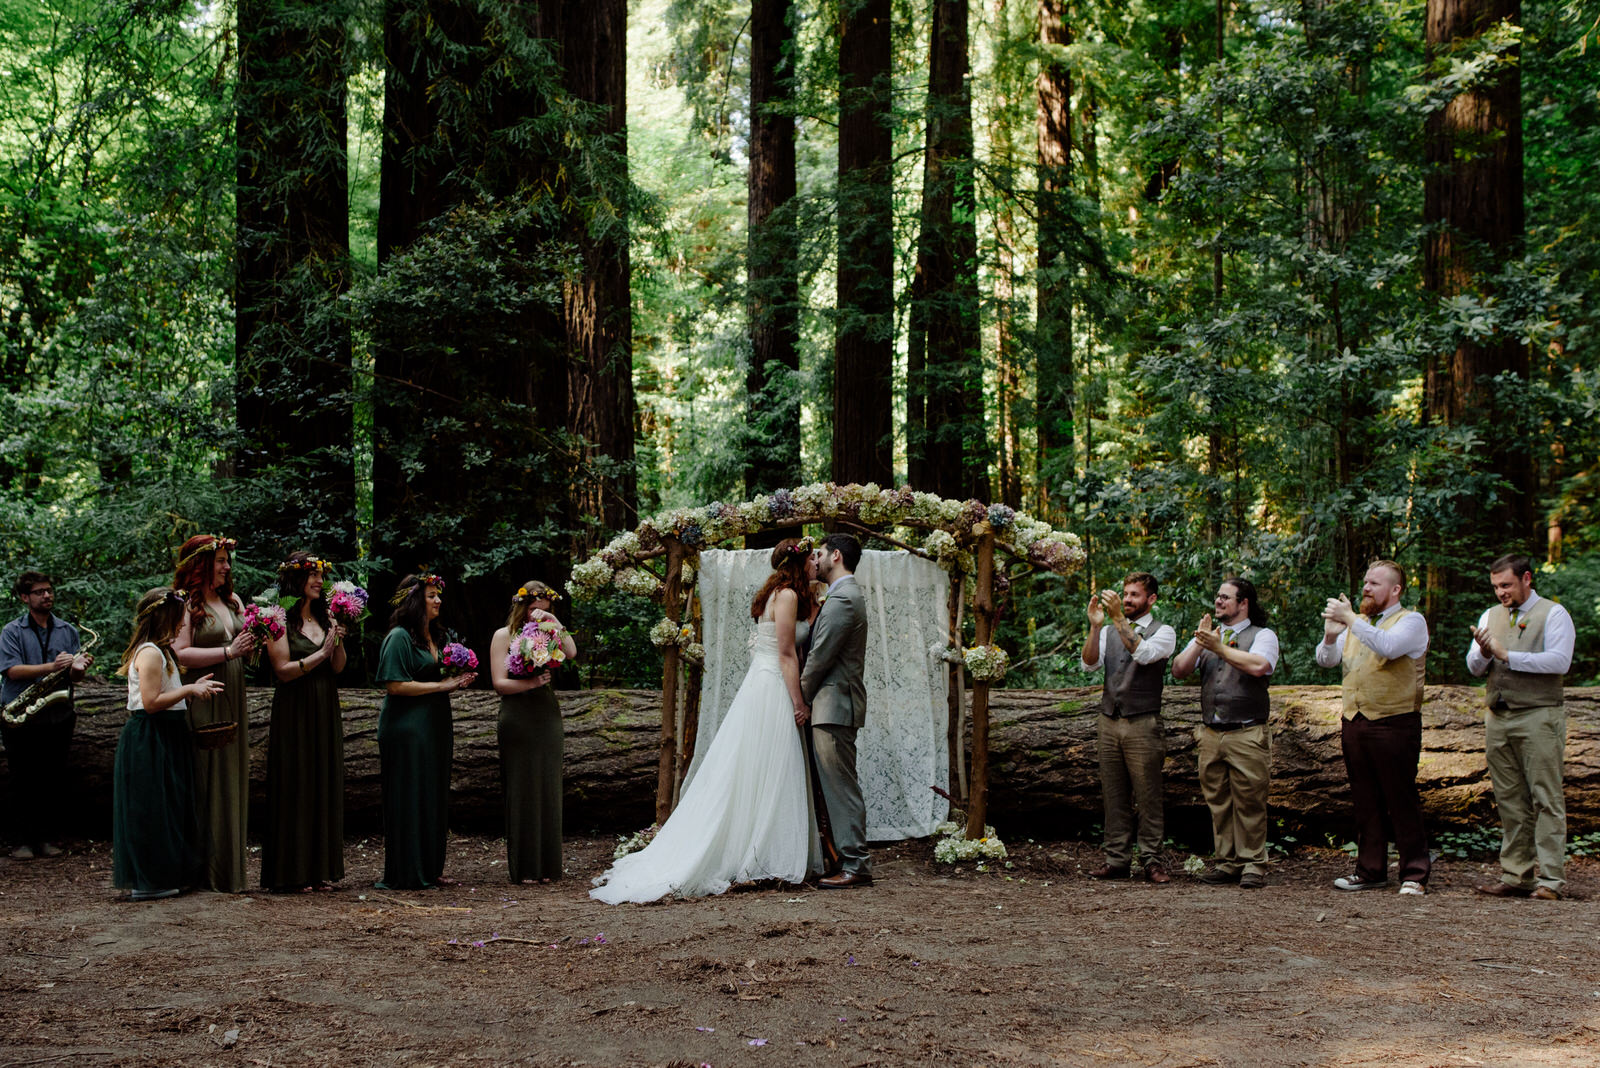 PamplinGroveWedding_Ceremony-Kiss_HumboldtWeddingPhotographer.jpg